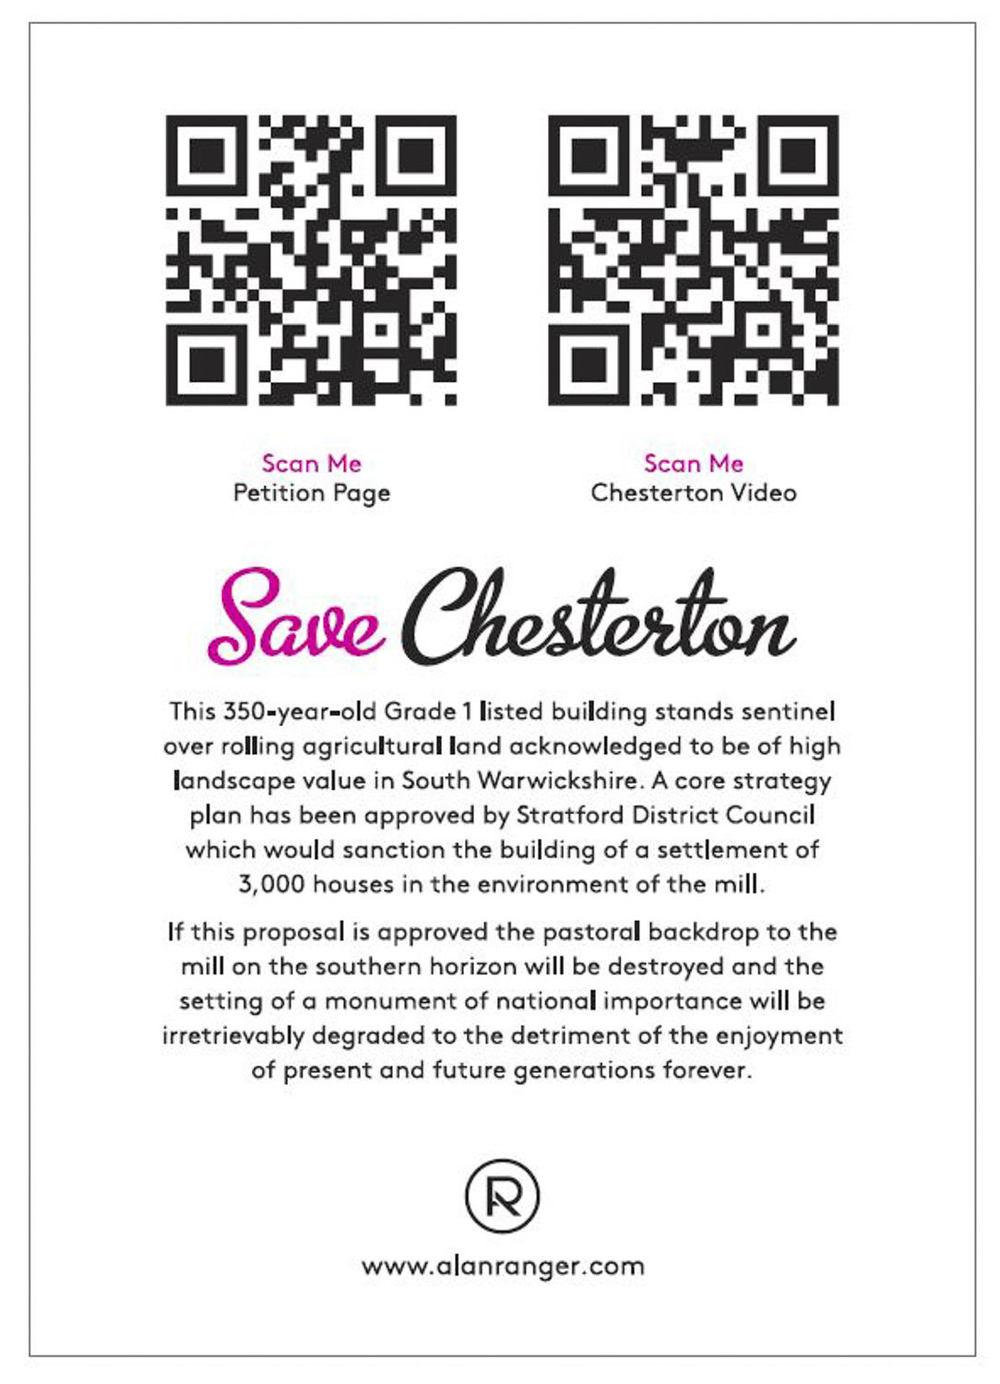 SaveChesterton